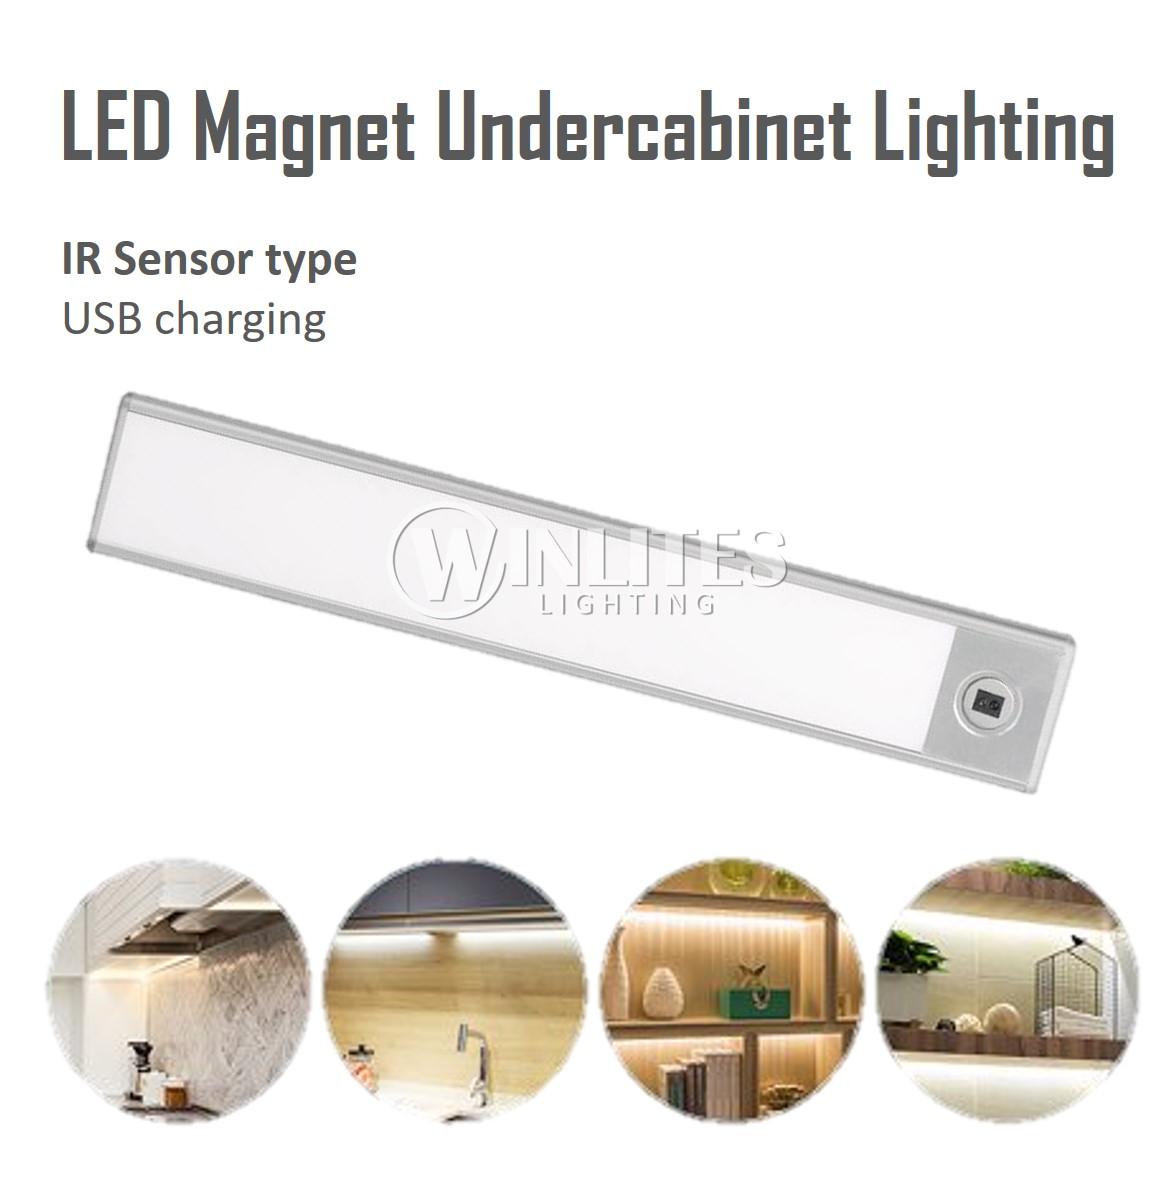 Ultra Slim Magnet Light - IR Sensor